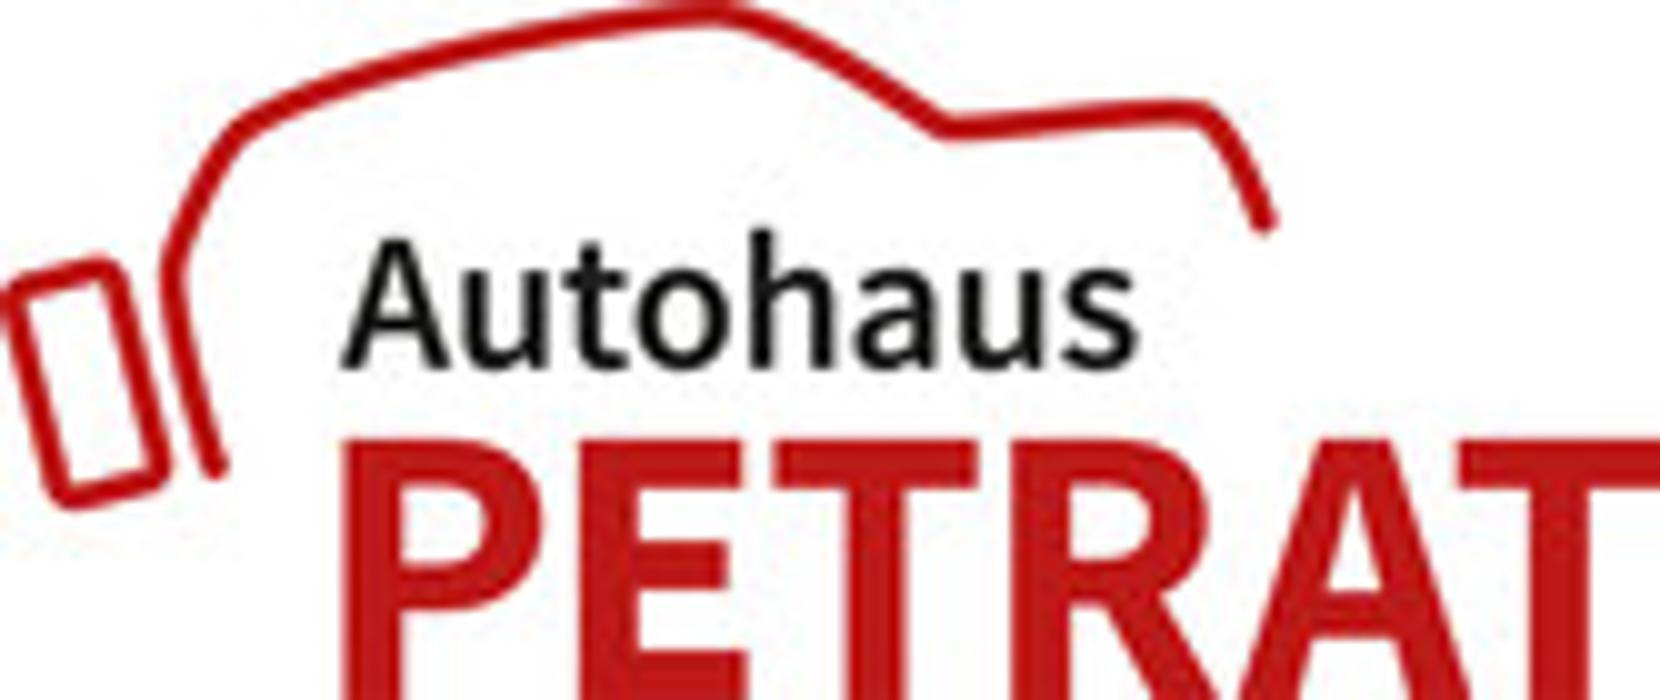 Bild zu Autohaus Petrat GmbH & Co. KG in Olsberg